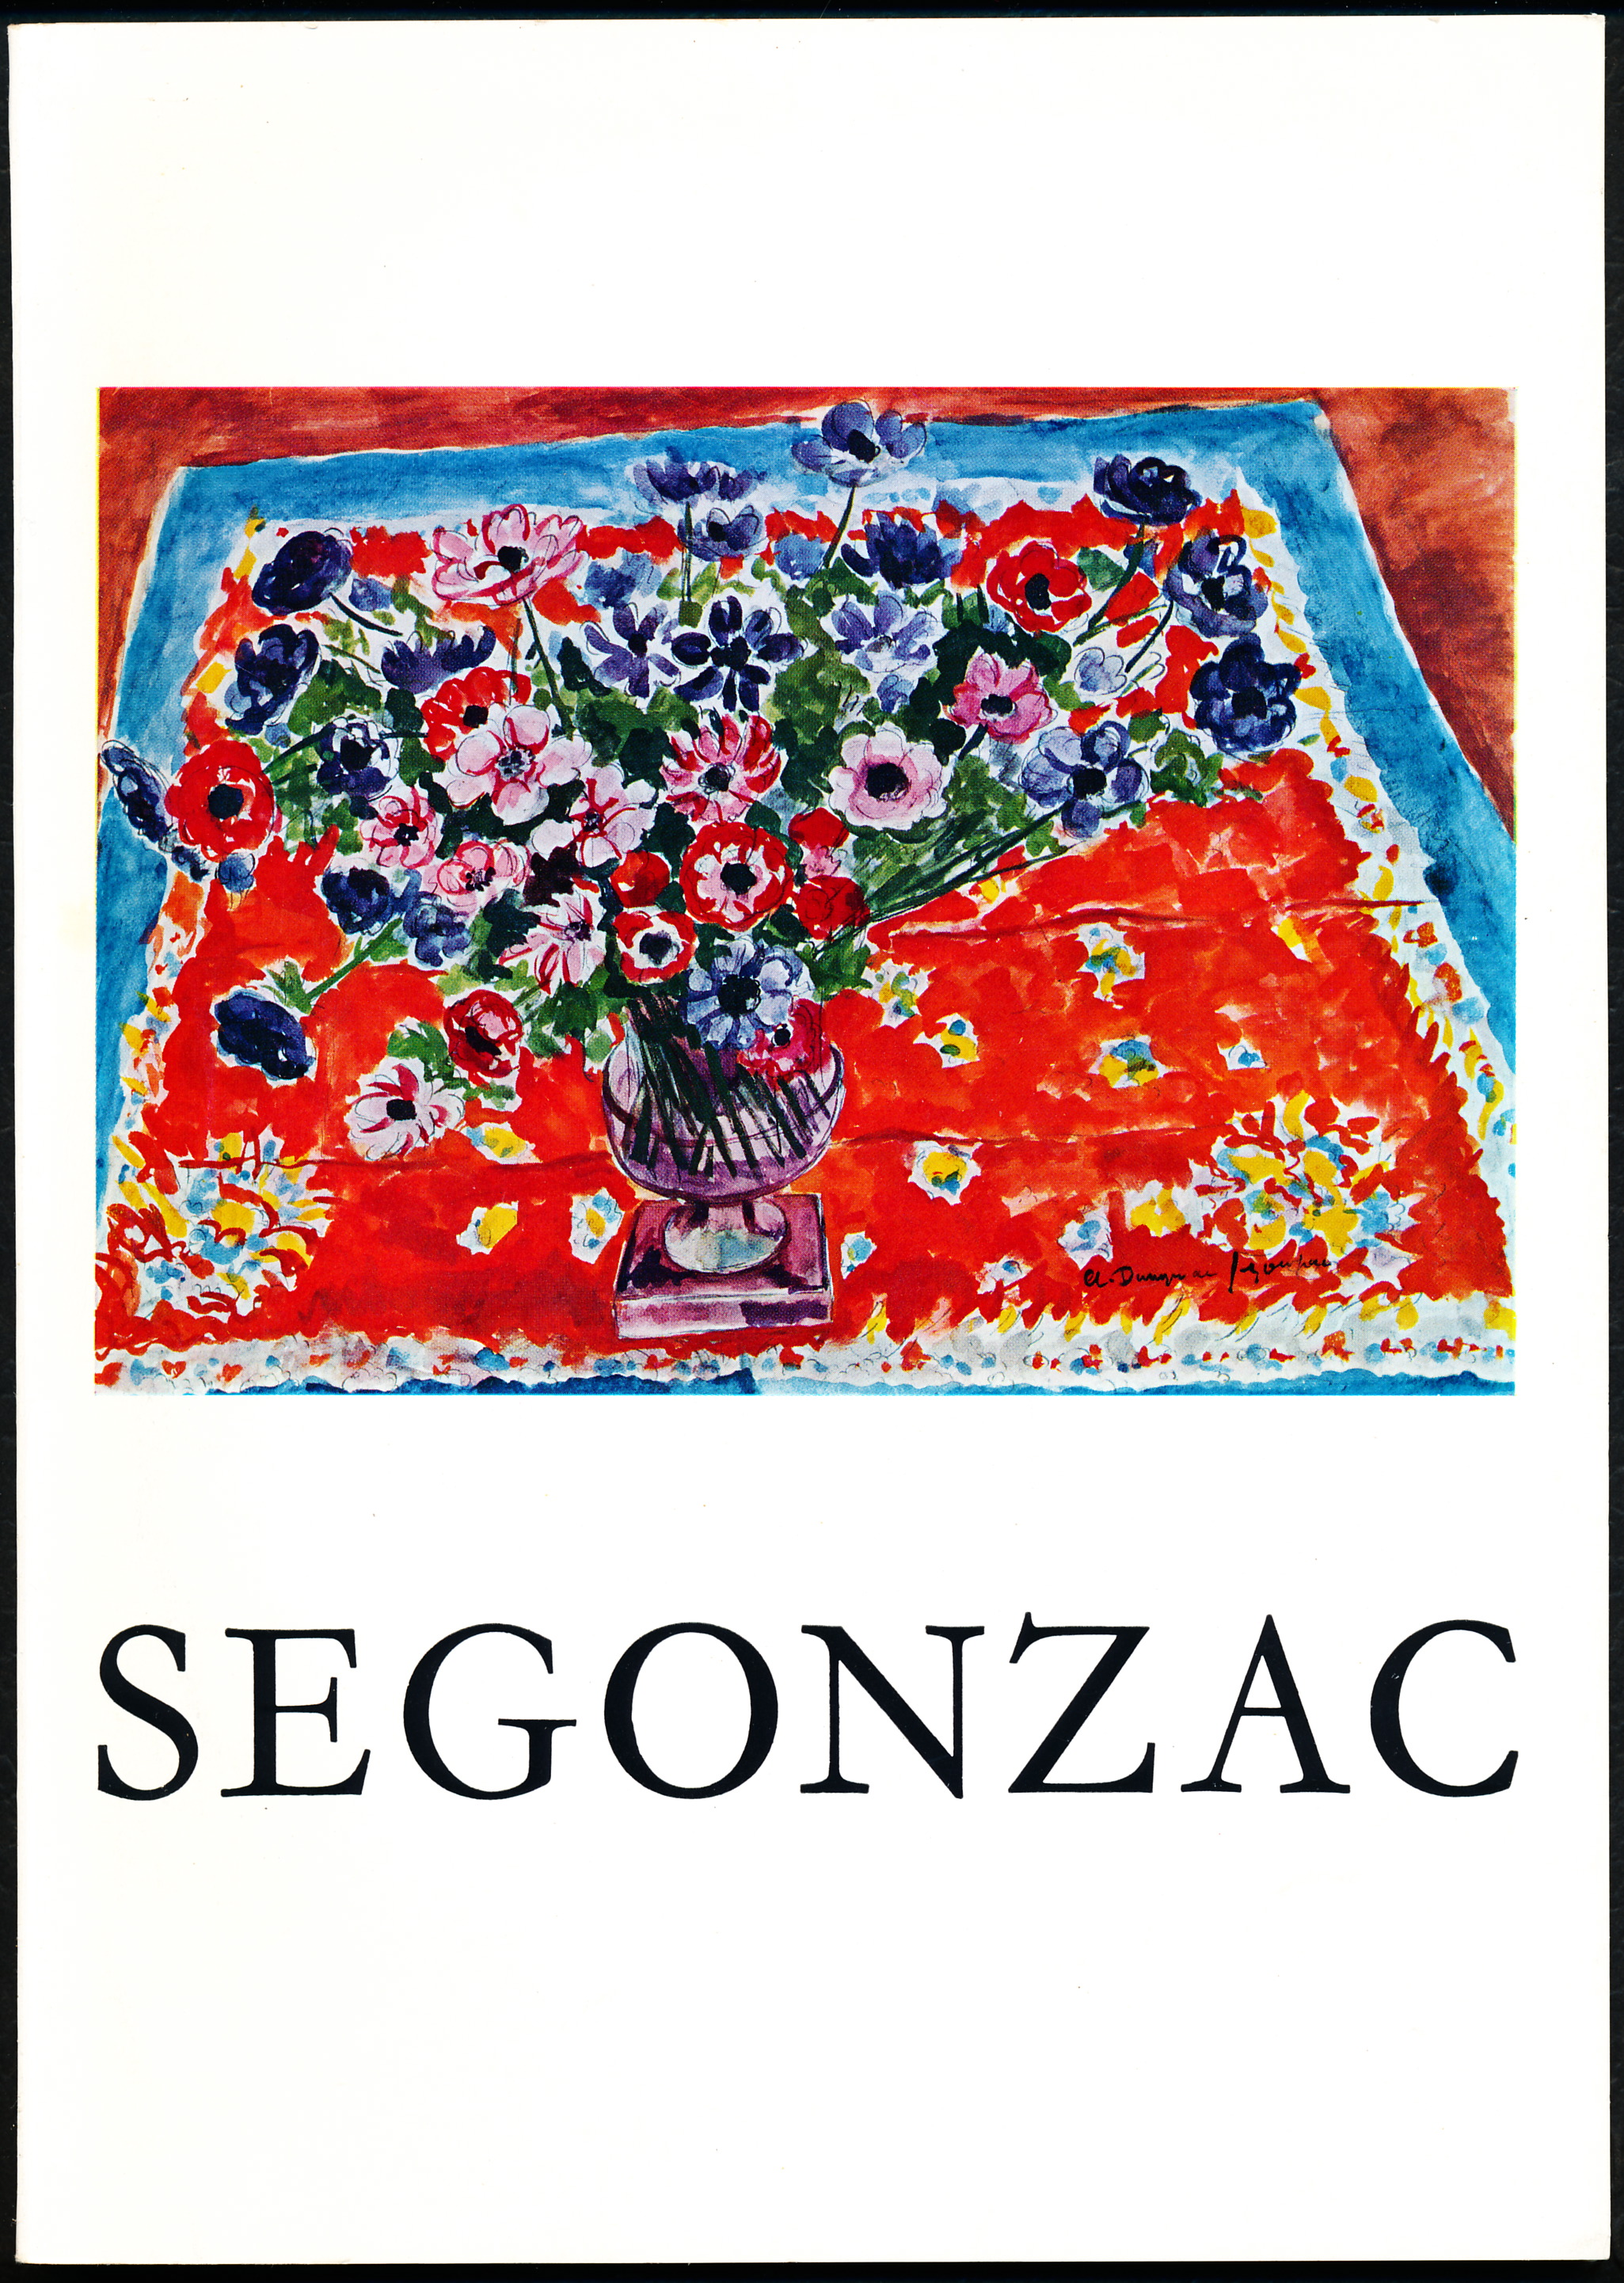 DUNOYER DE SEGONZAC - Acquavella Galleries, New York - 1966 d'Andre; Et Al Dunoyer De Segonzac